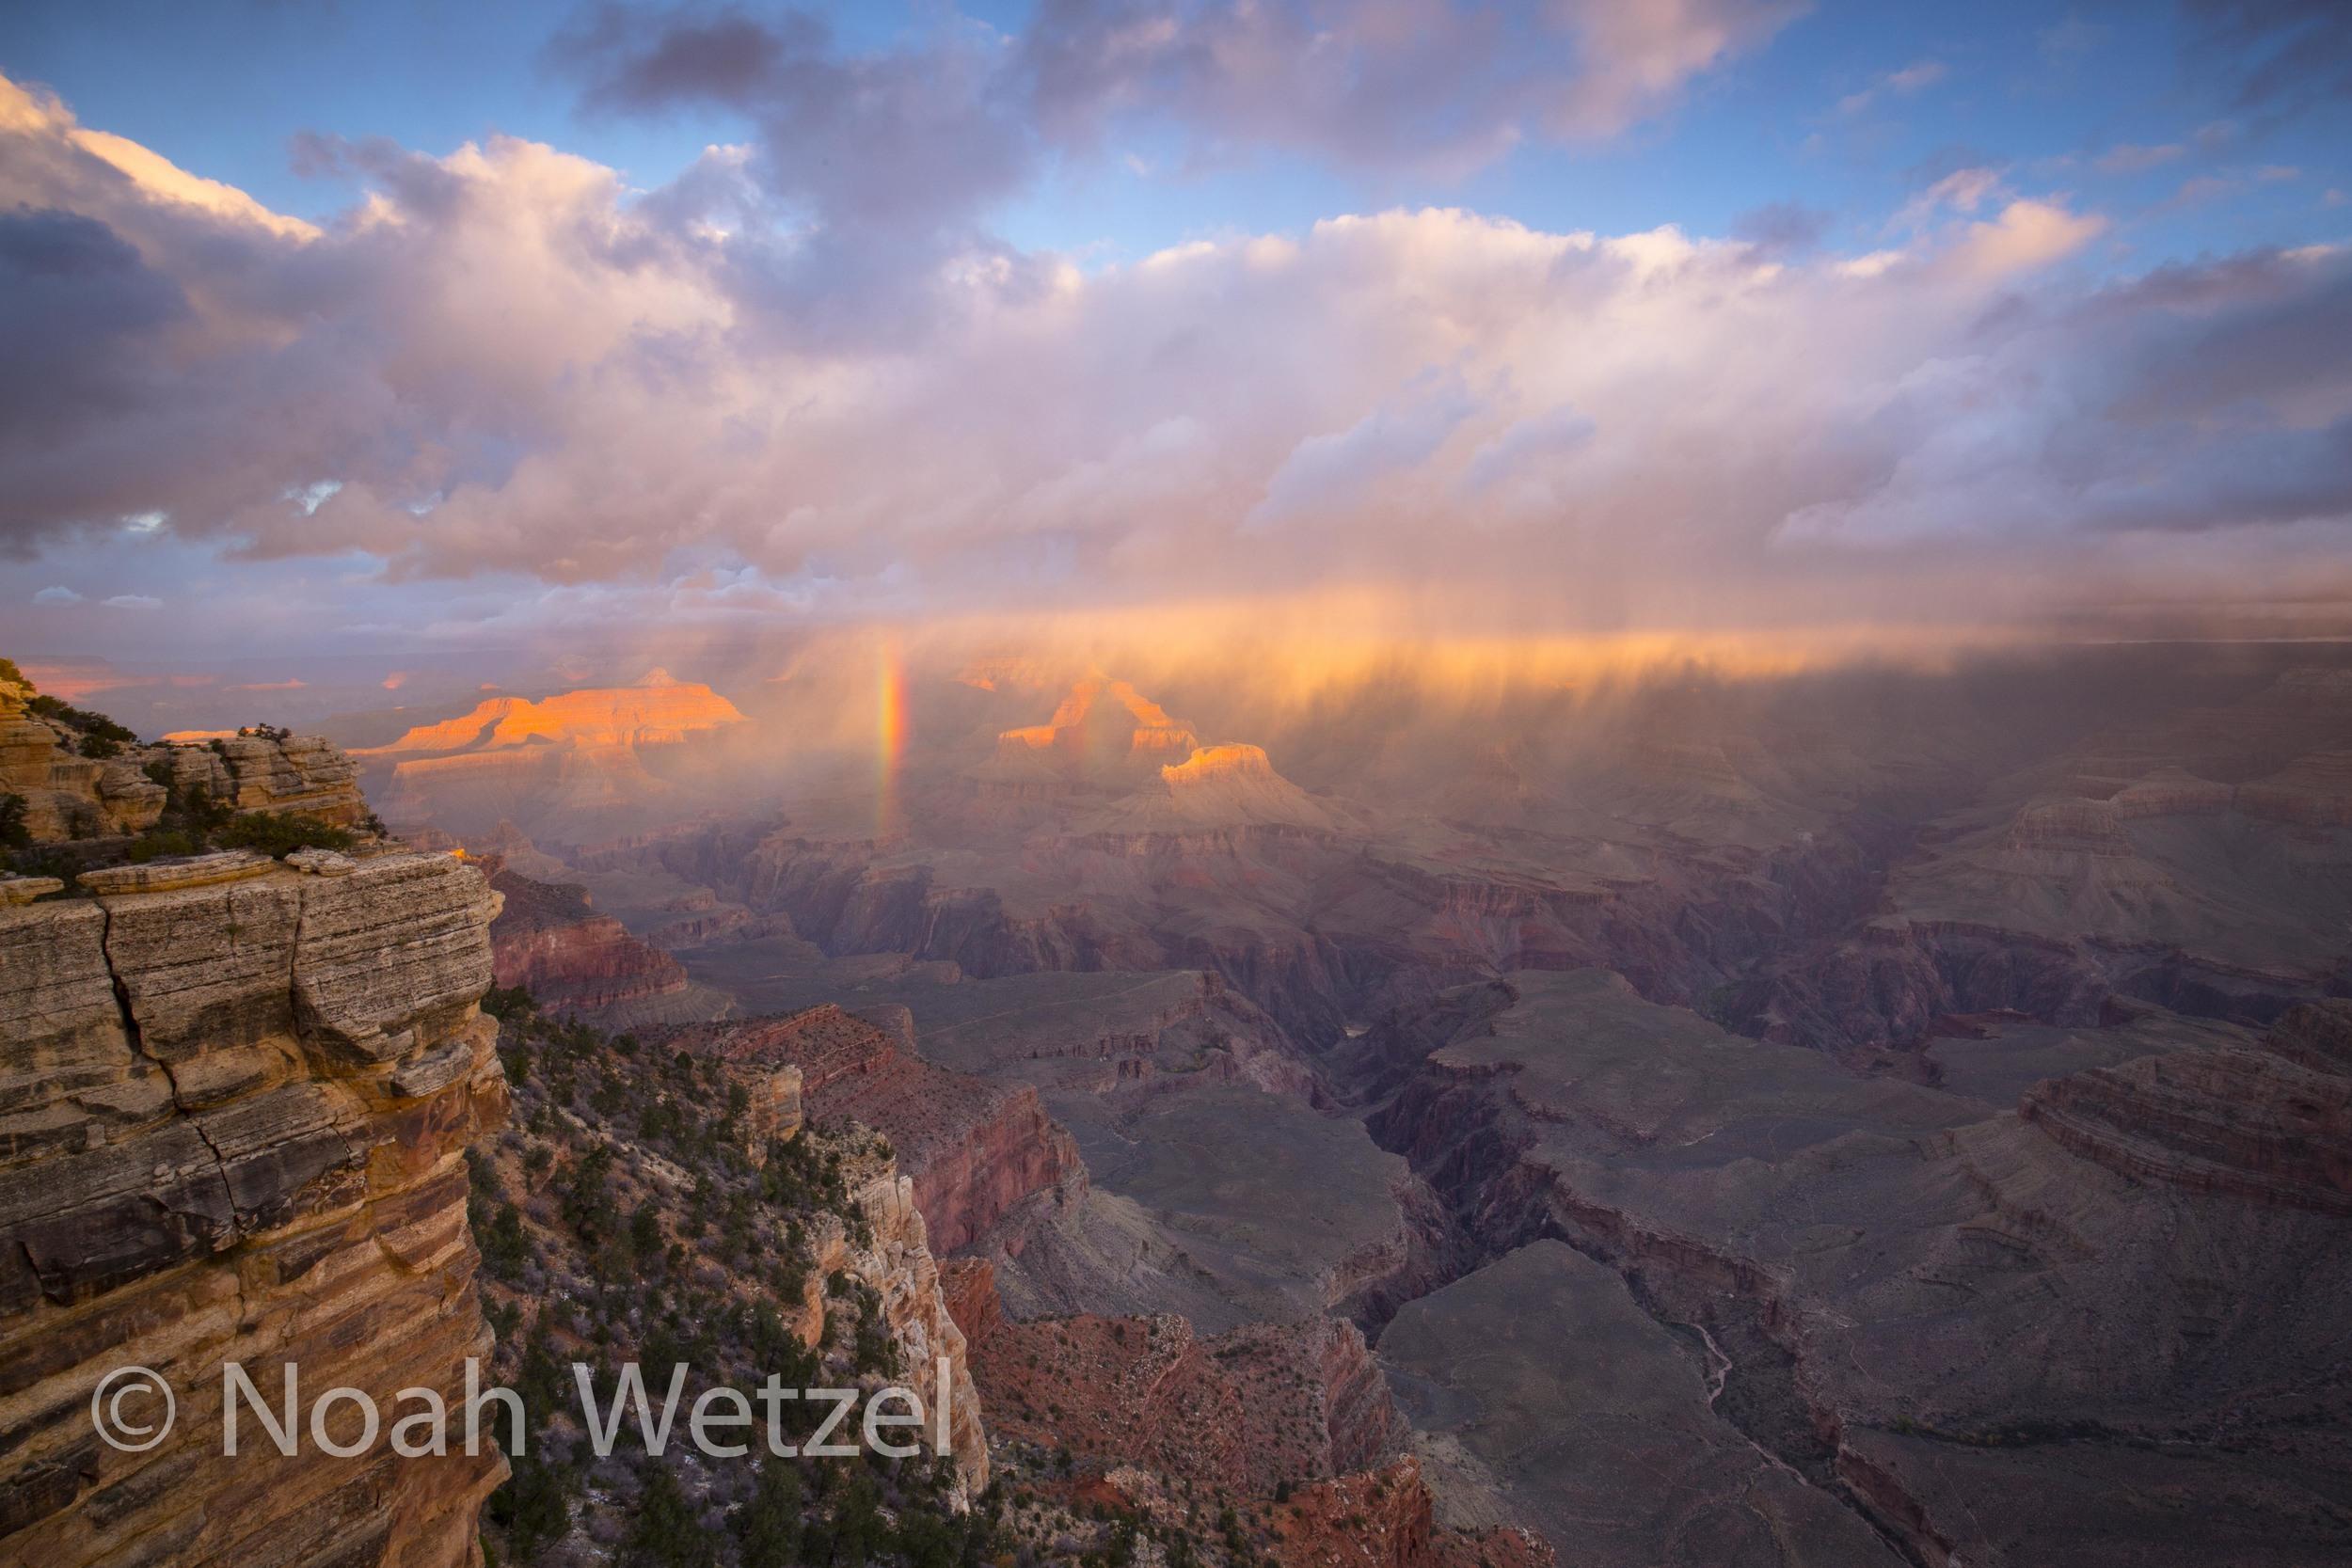 Double Rainbow Sunrise in Grand Canyon National Park, Arizona.